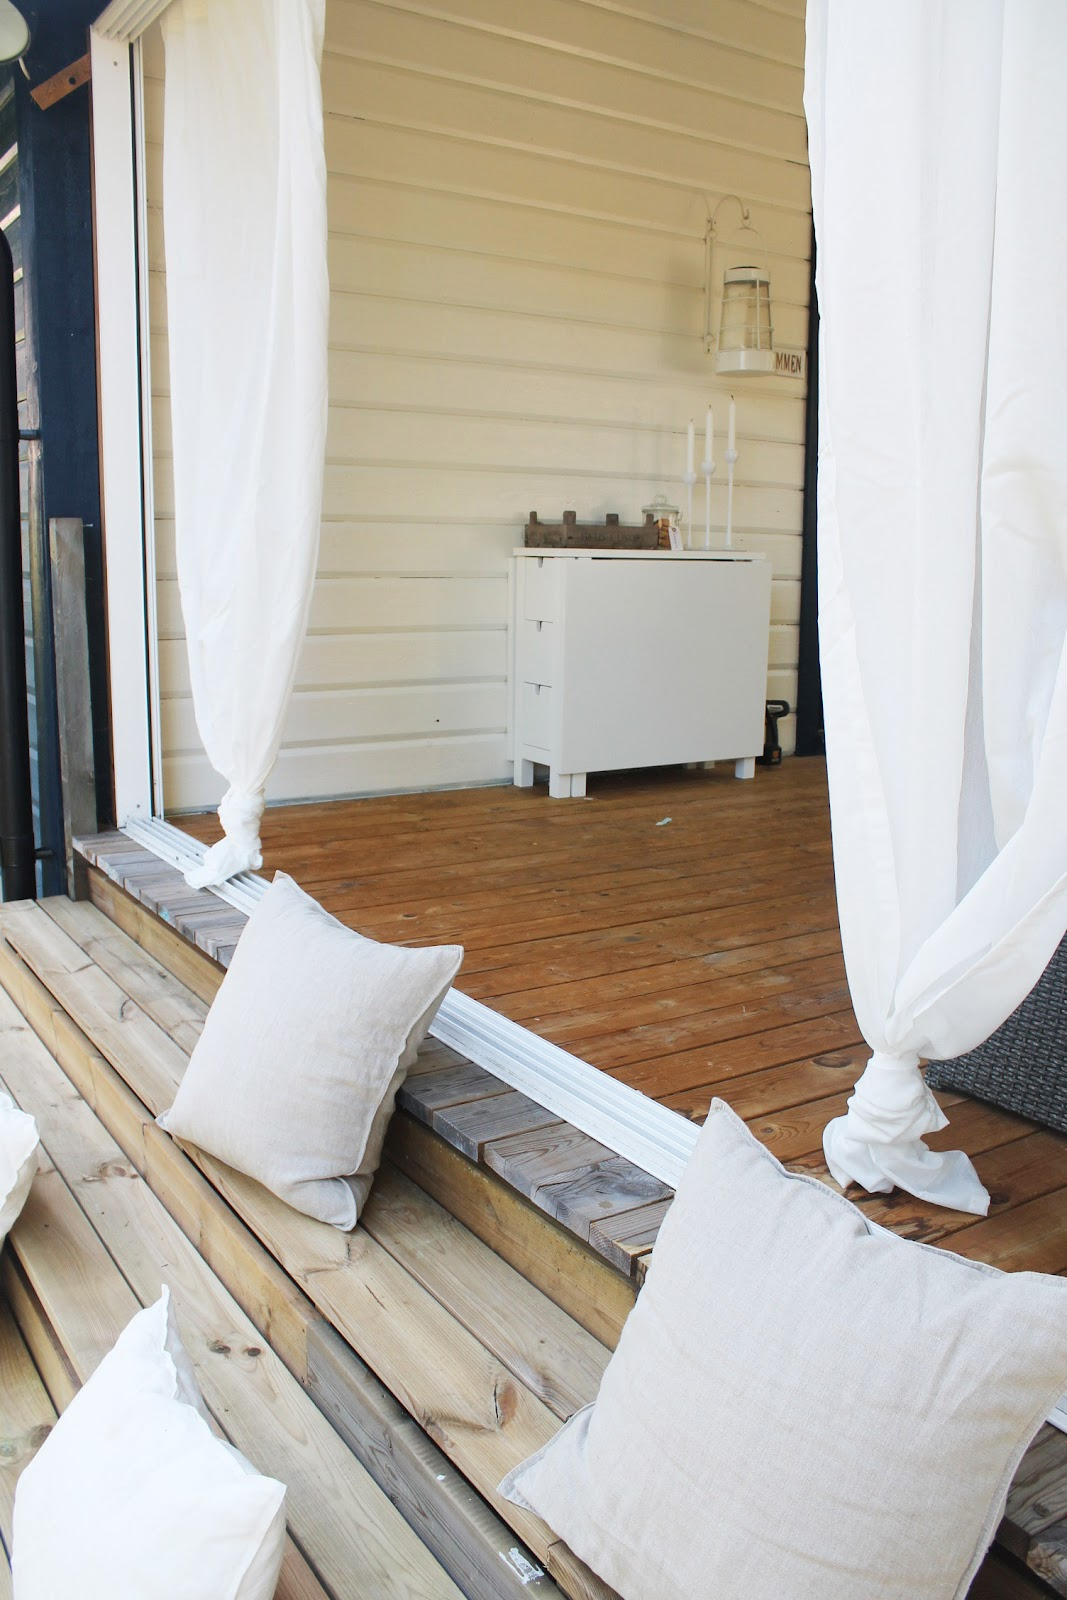 Lifestyle by lena: en aning lounge kÄnsla pÅ altanen!